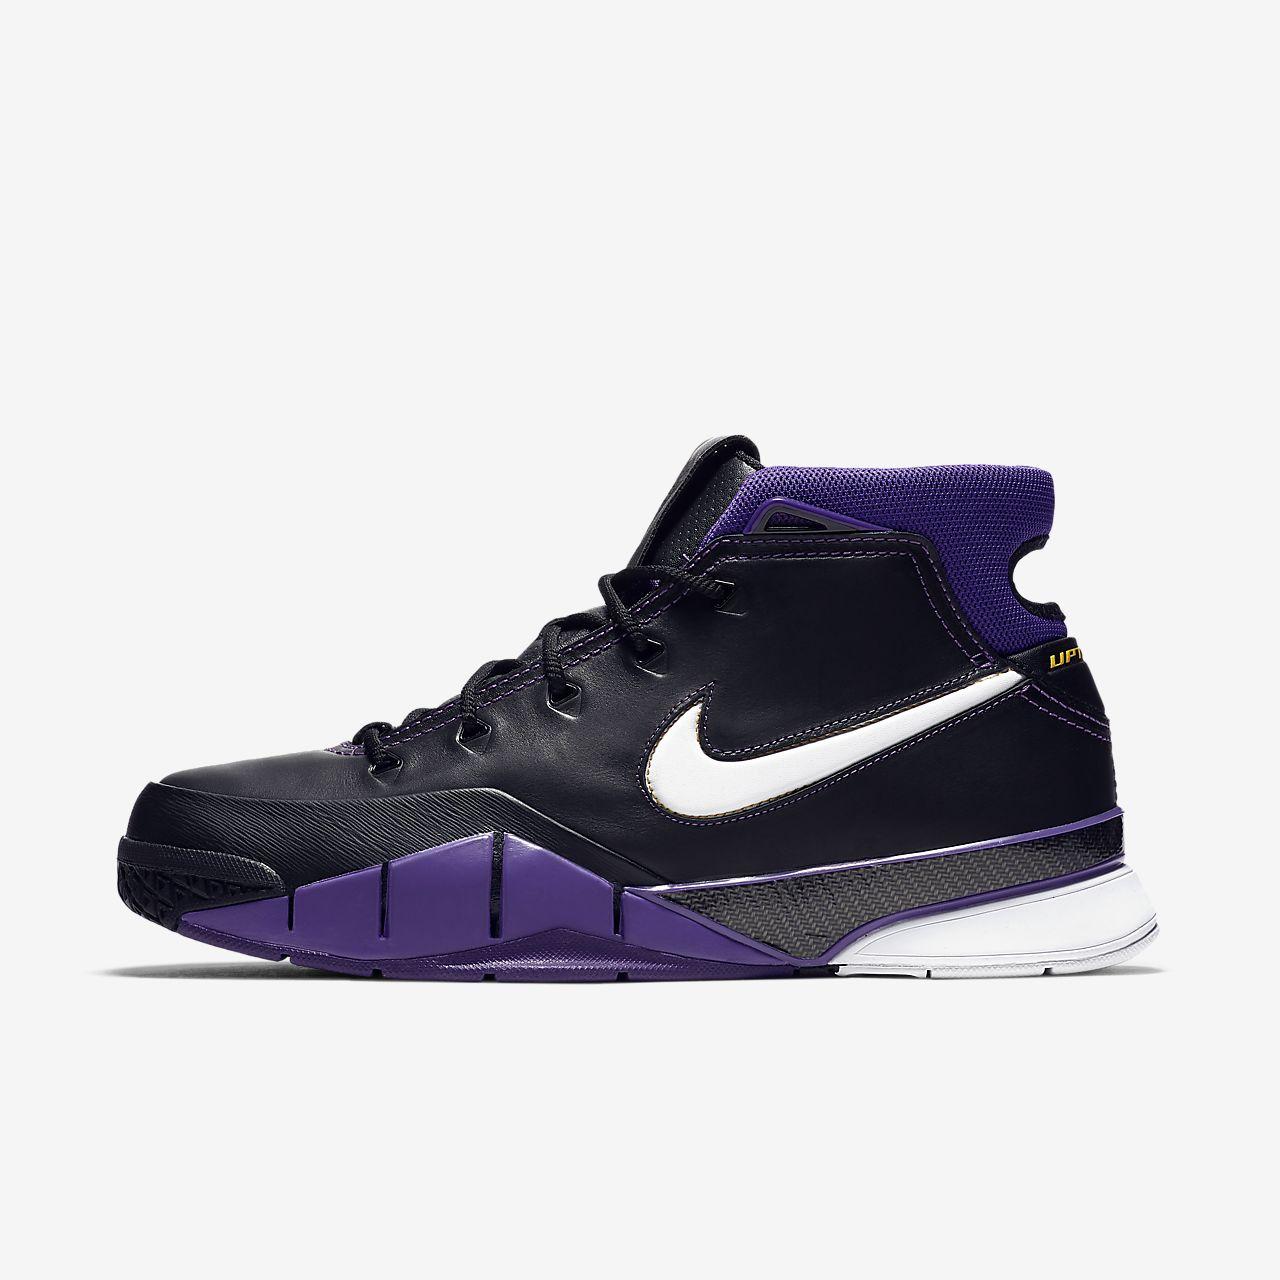 Chaussure de basketball Kobe 1 Protro